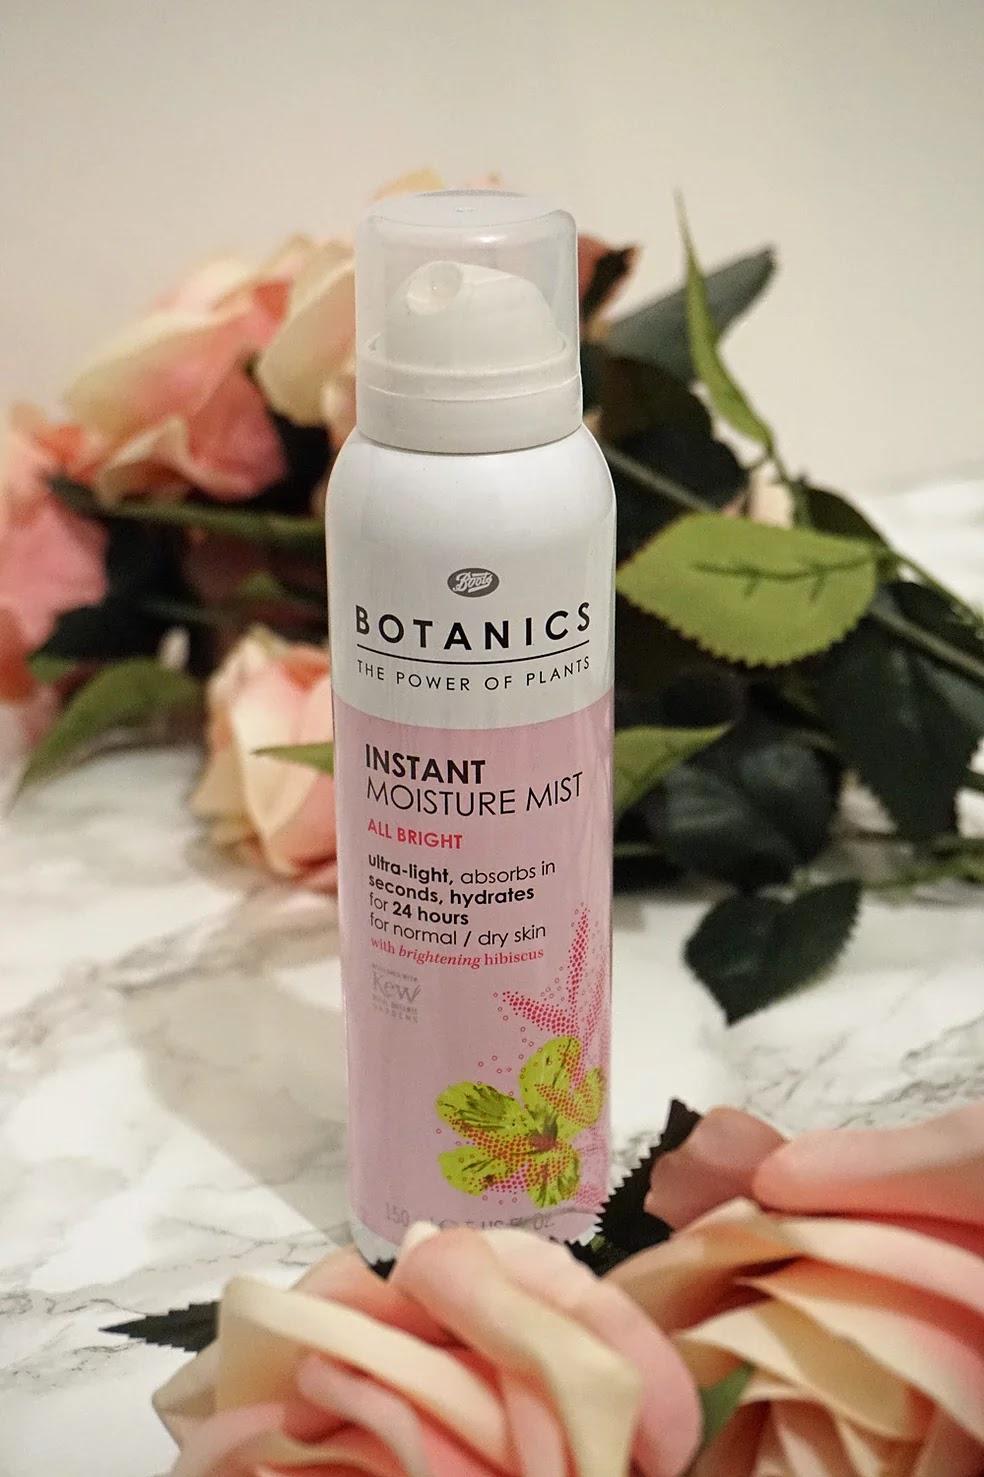 Boots botanics instant moisture mist